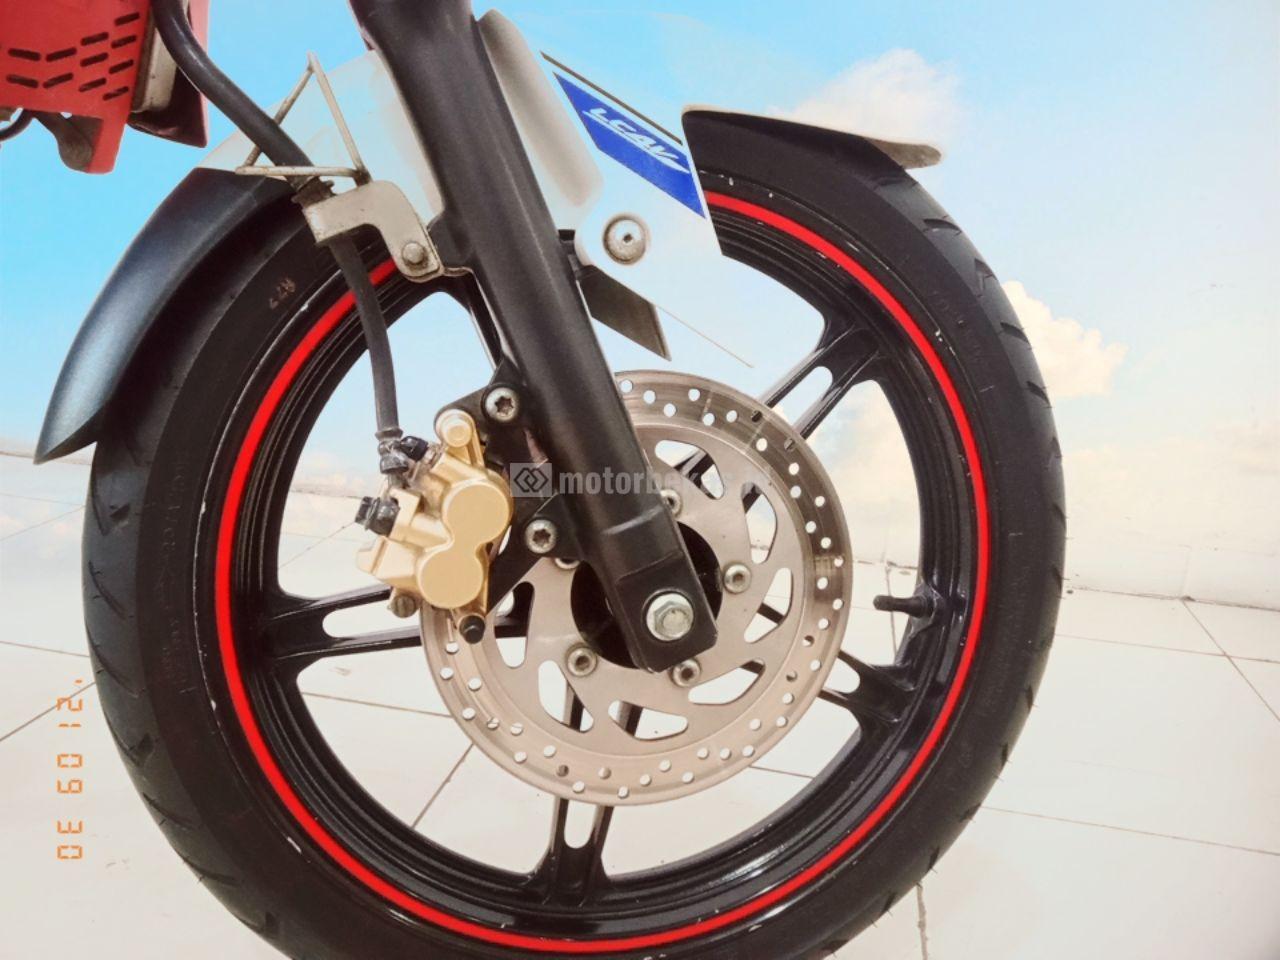 YAMAHA VIXION FI 2014 motorbekas.id